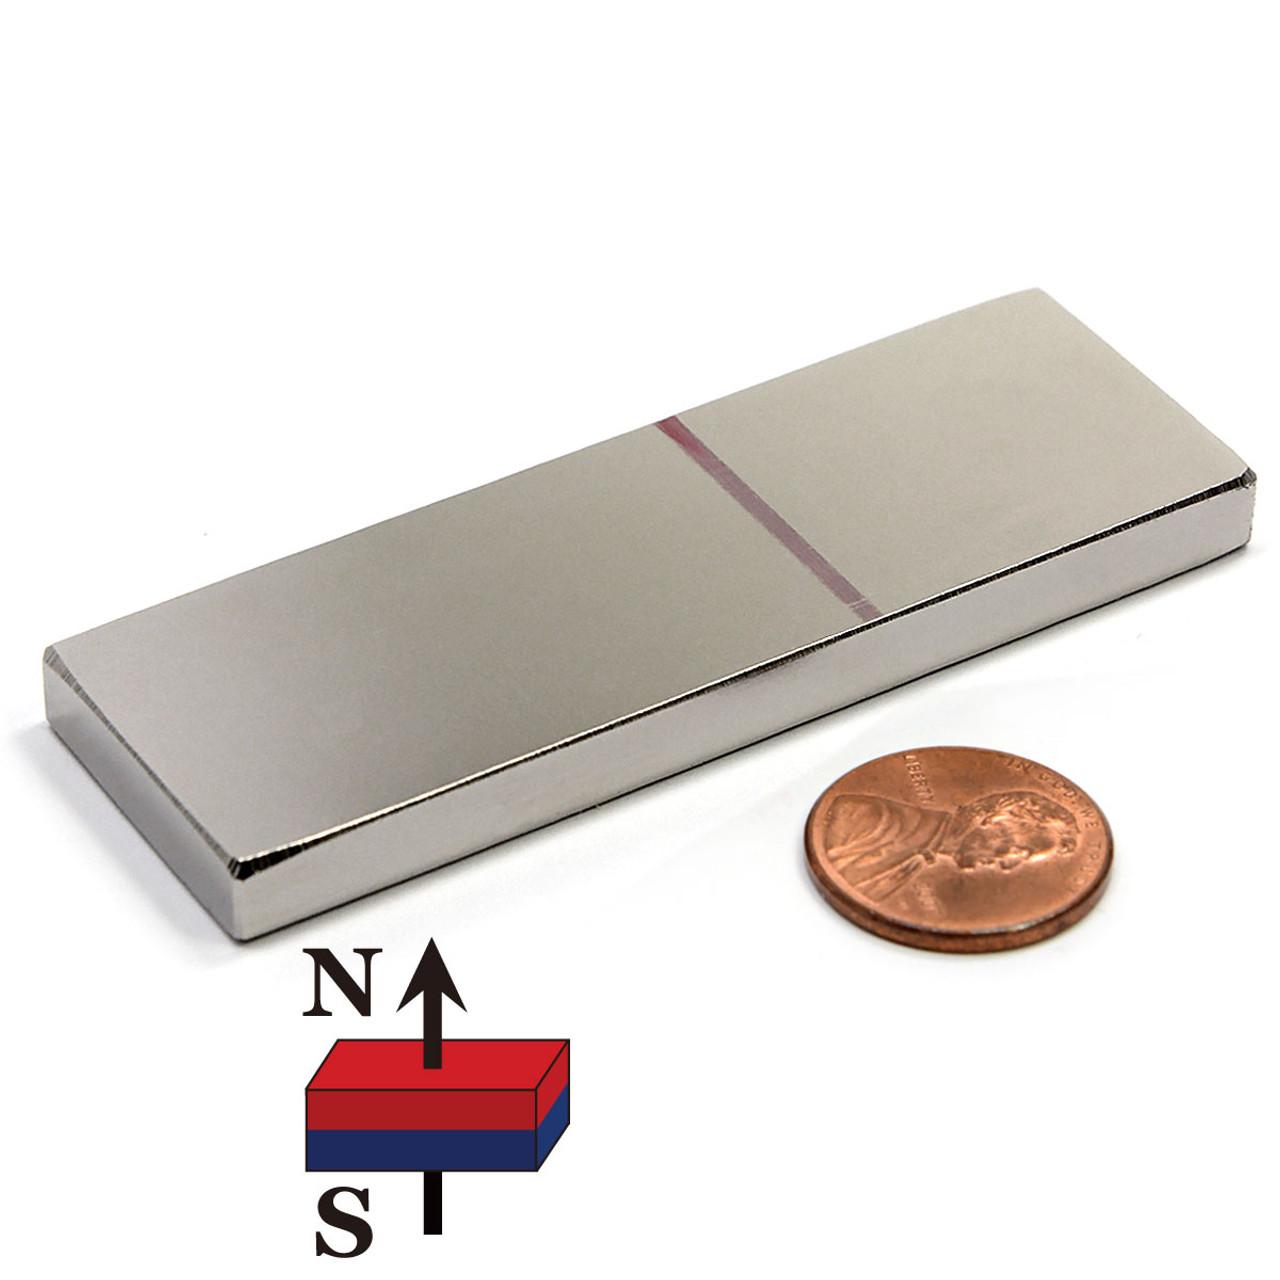 200x Neodymium Magnet Block 7x7x3 N52 Gold Plated